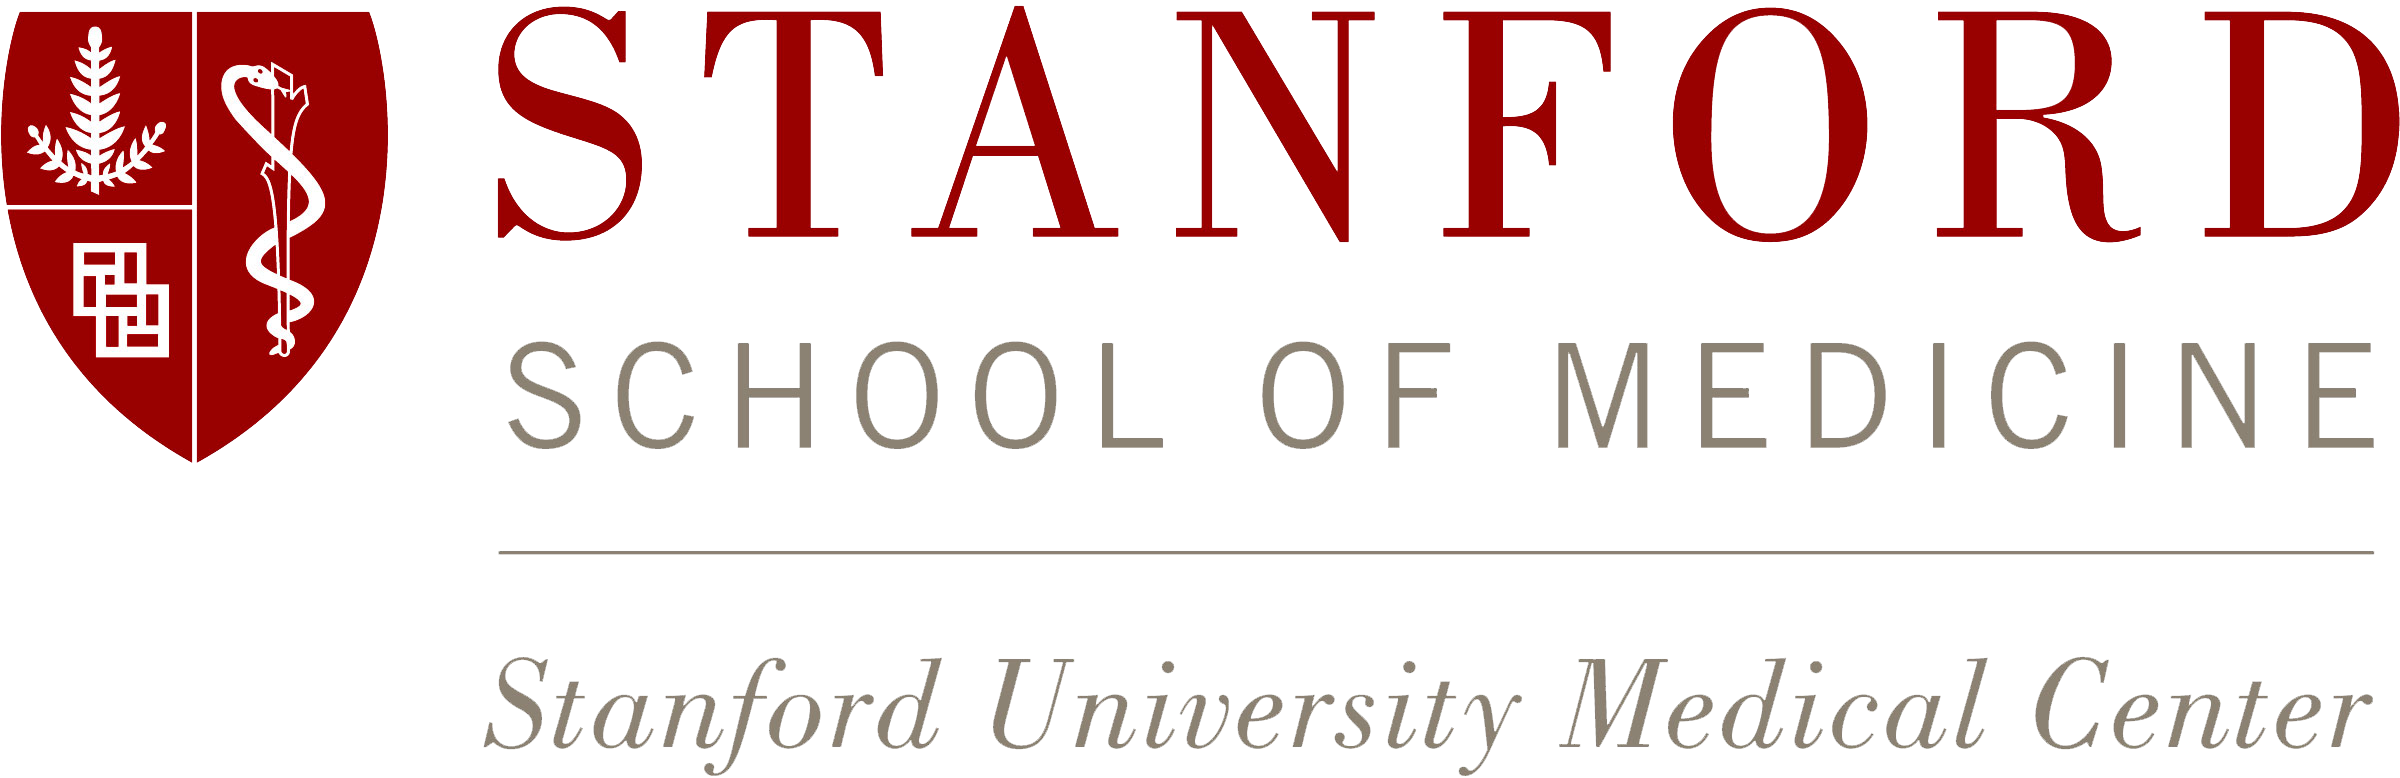 Stanford_School_of_Medicine_Logo.png